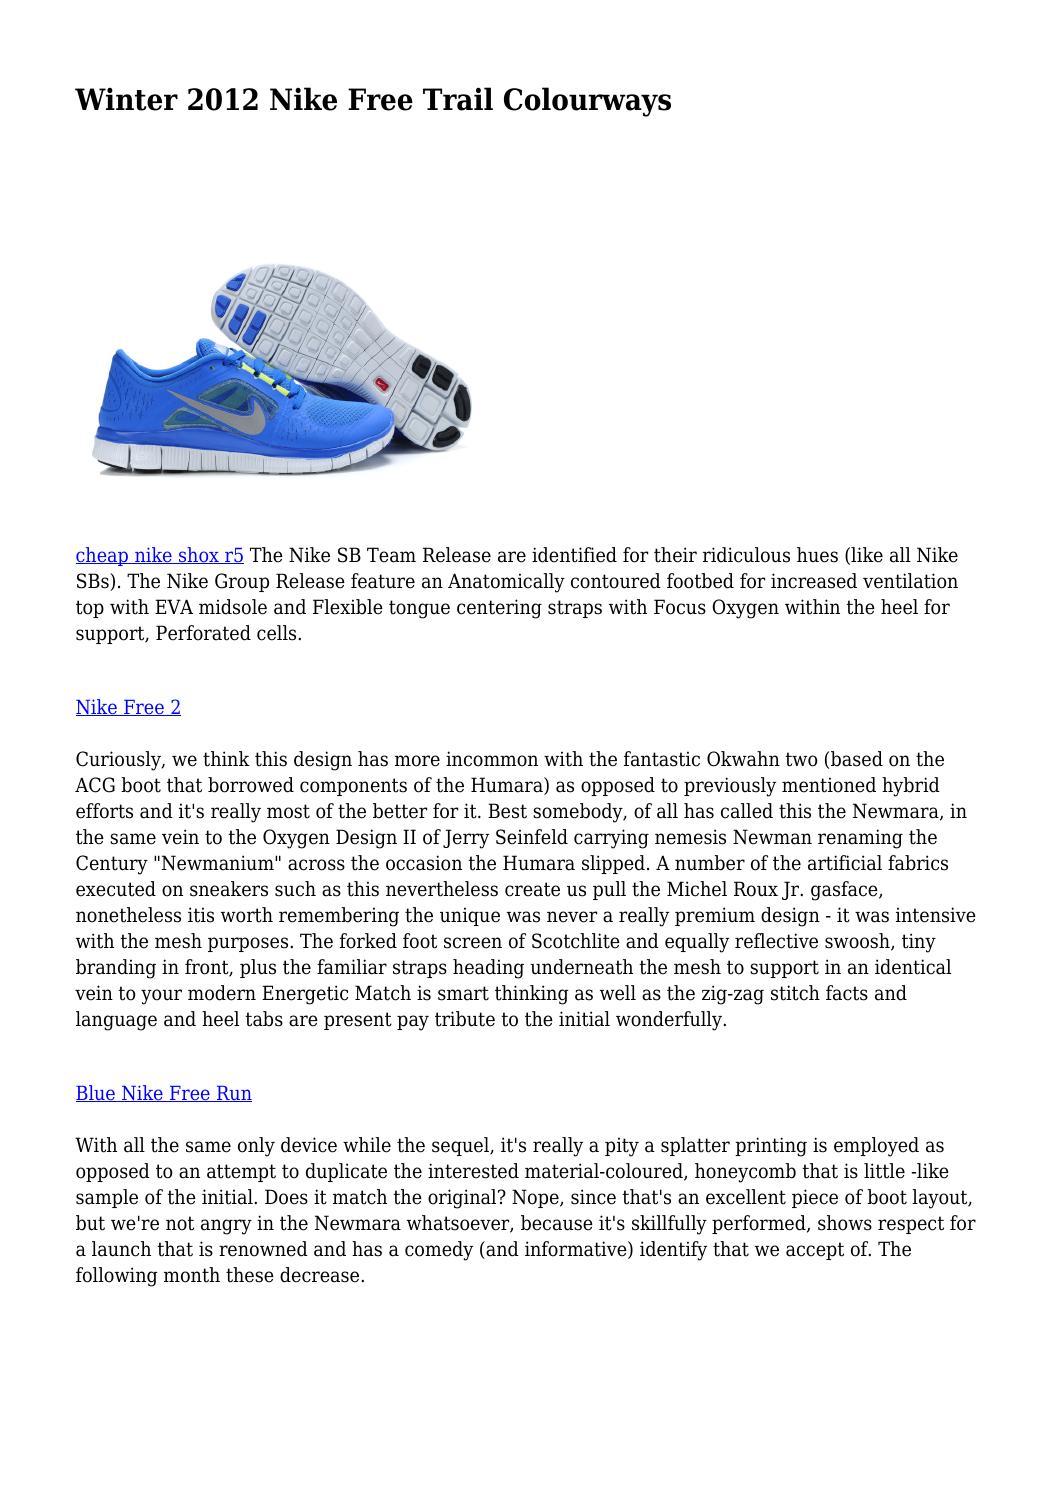 Winter 2012 Nike Free Trail Colourways by longzit2277 issuu